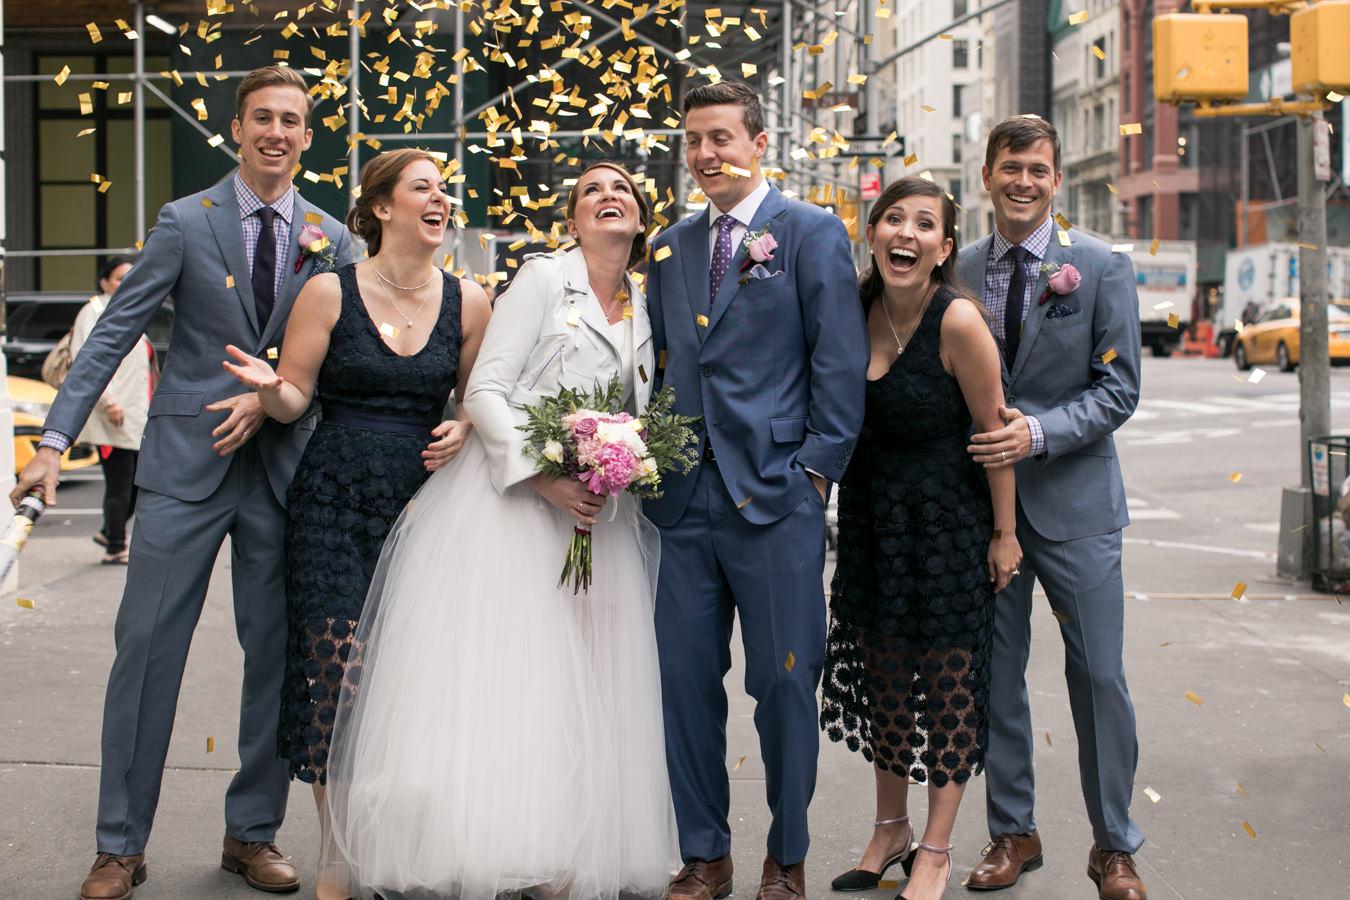 Modern + Urban NYC Wedding Inspiration - photo by Gina Esposito Photography http://ruffledblog.com/modern-urban-nyc-wedding-inspiration